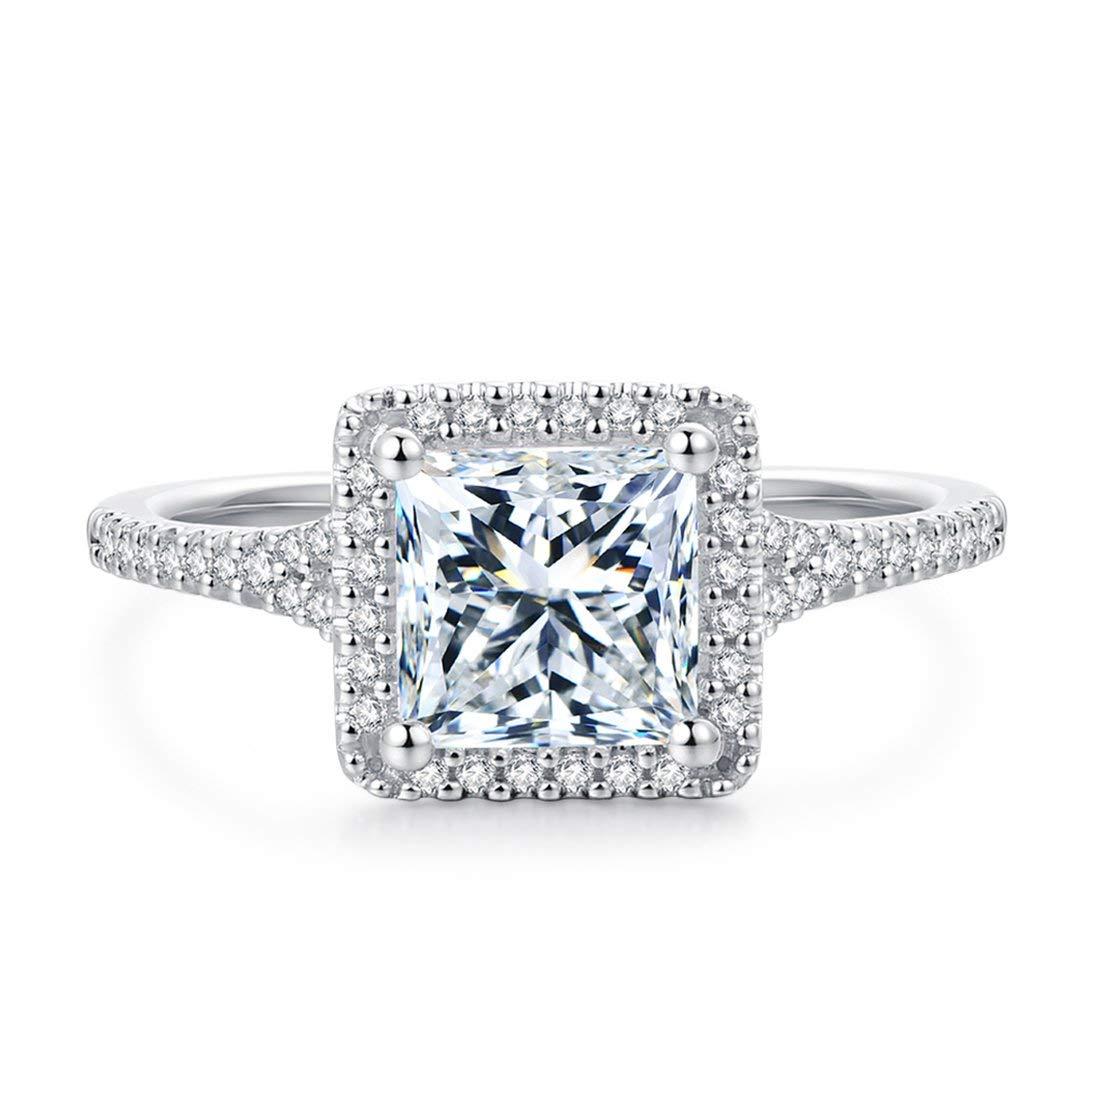 HAFEEZ CENTER 6.5mm 1.5 Carat Princess Cut Simulated Diamond Cubic Zirconia Halo Engagement Rings for Women